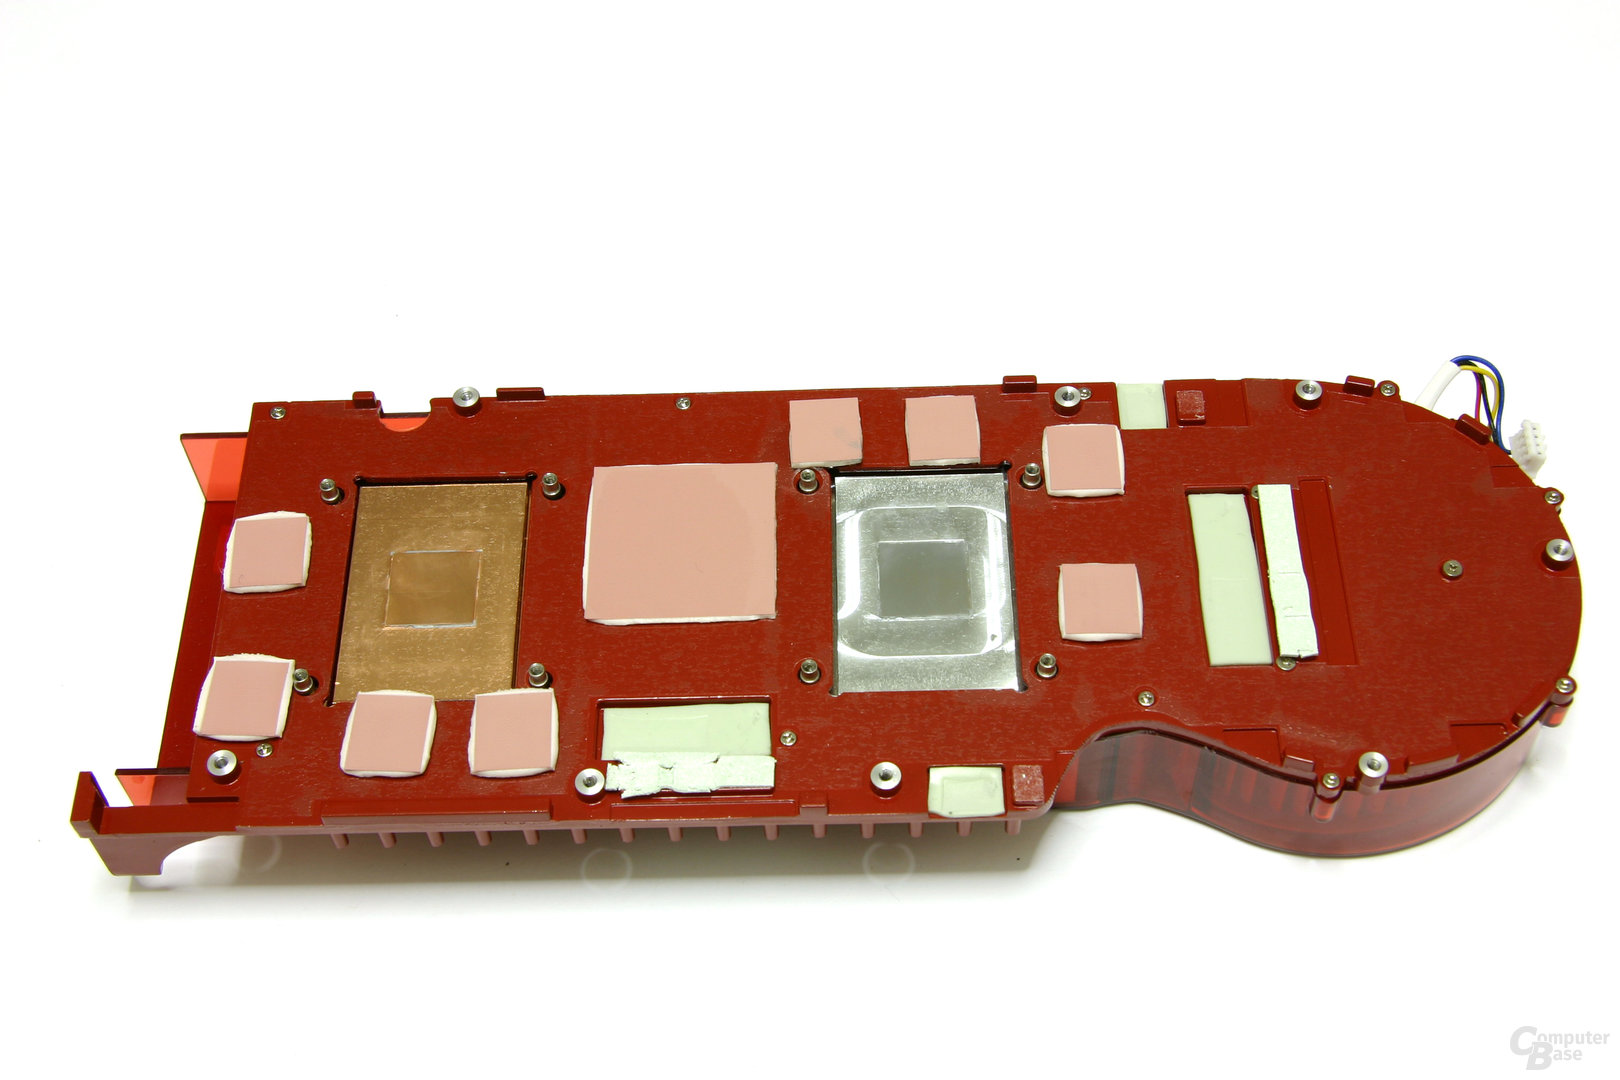 Radeon HD 3870 X2 Kühlerrückseite